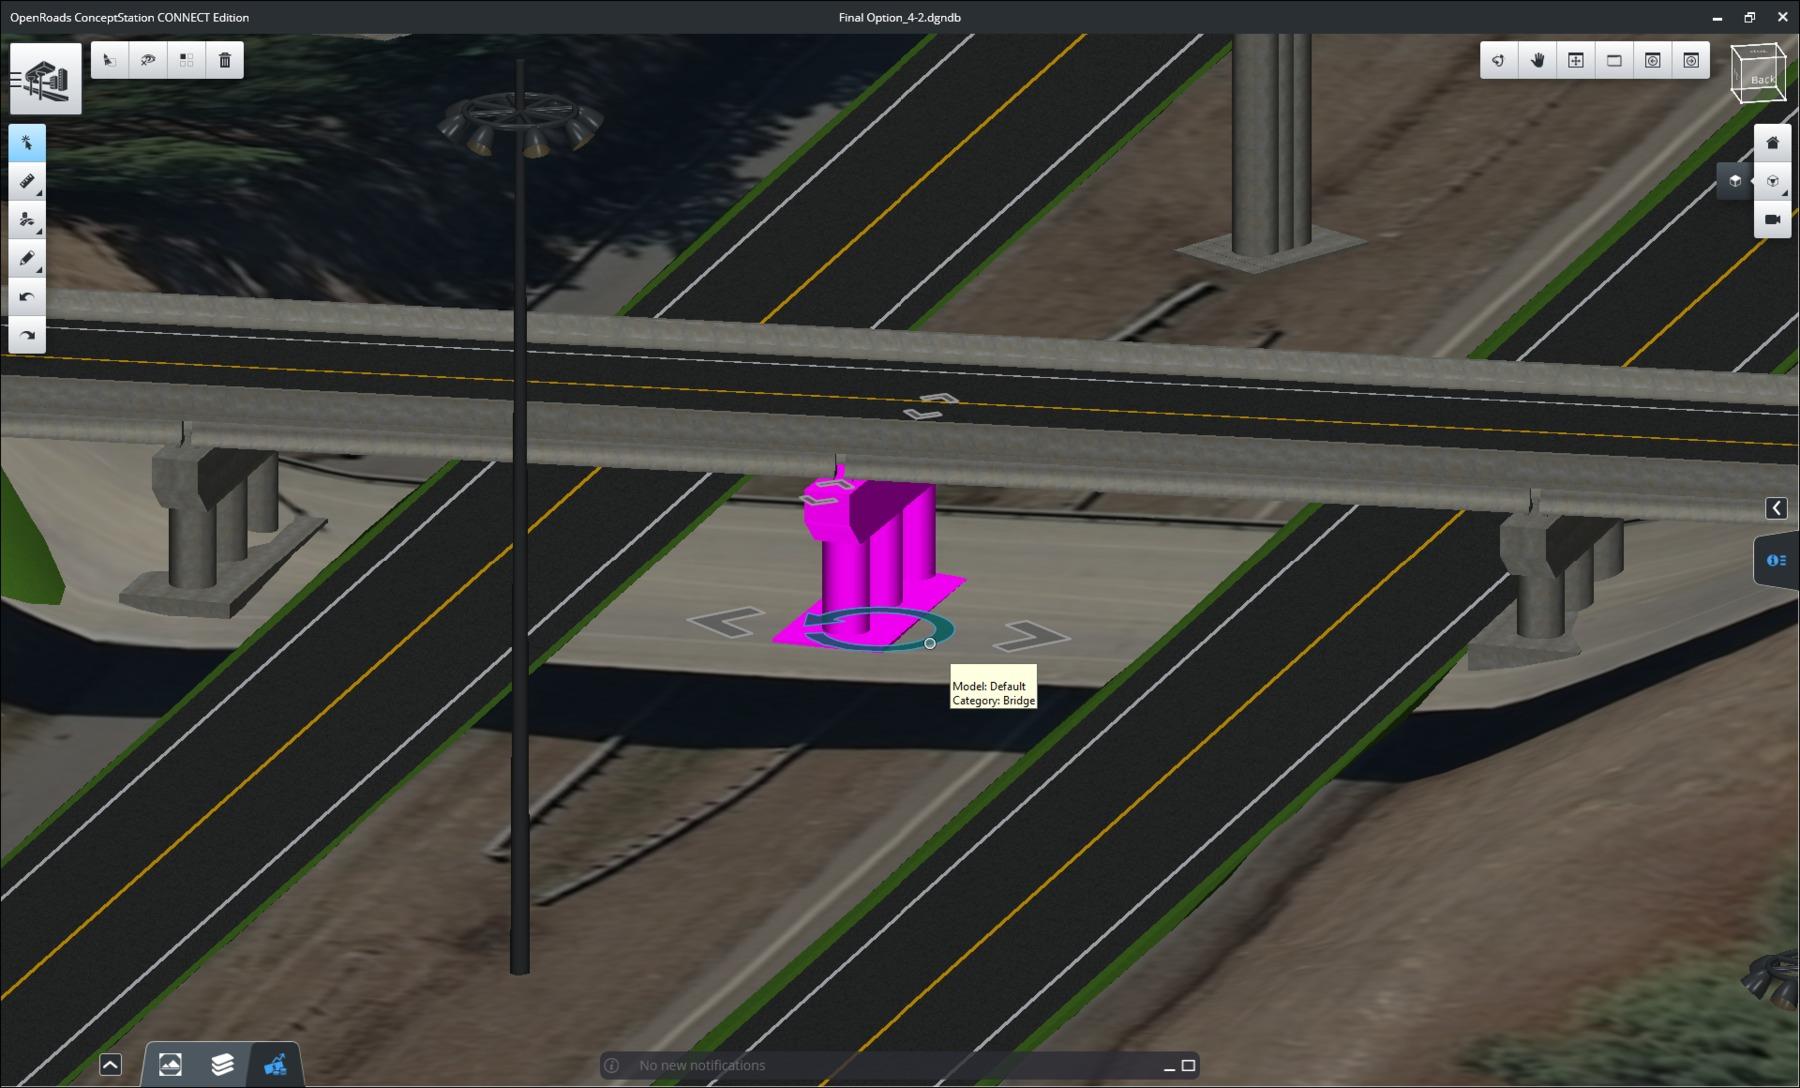 Bentley Announces Openroads Conceptstation Tenlinks News